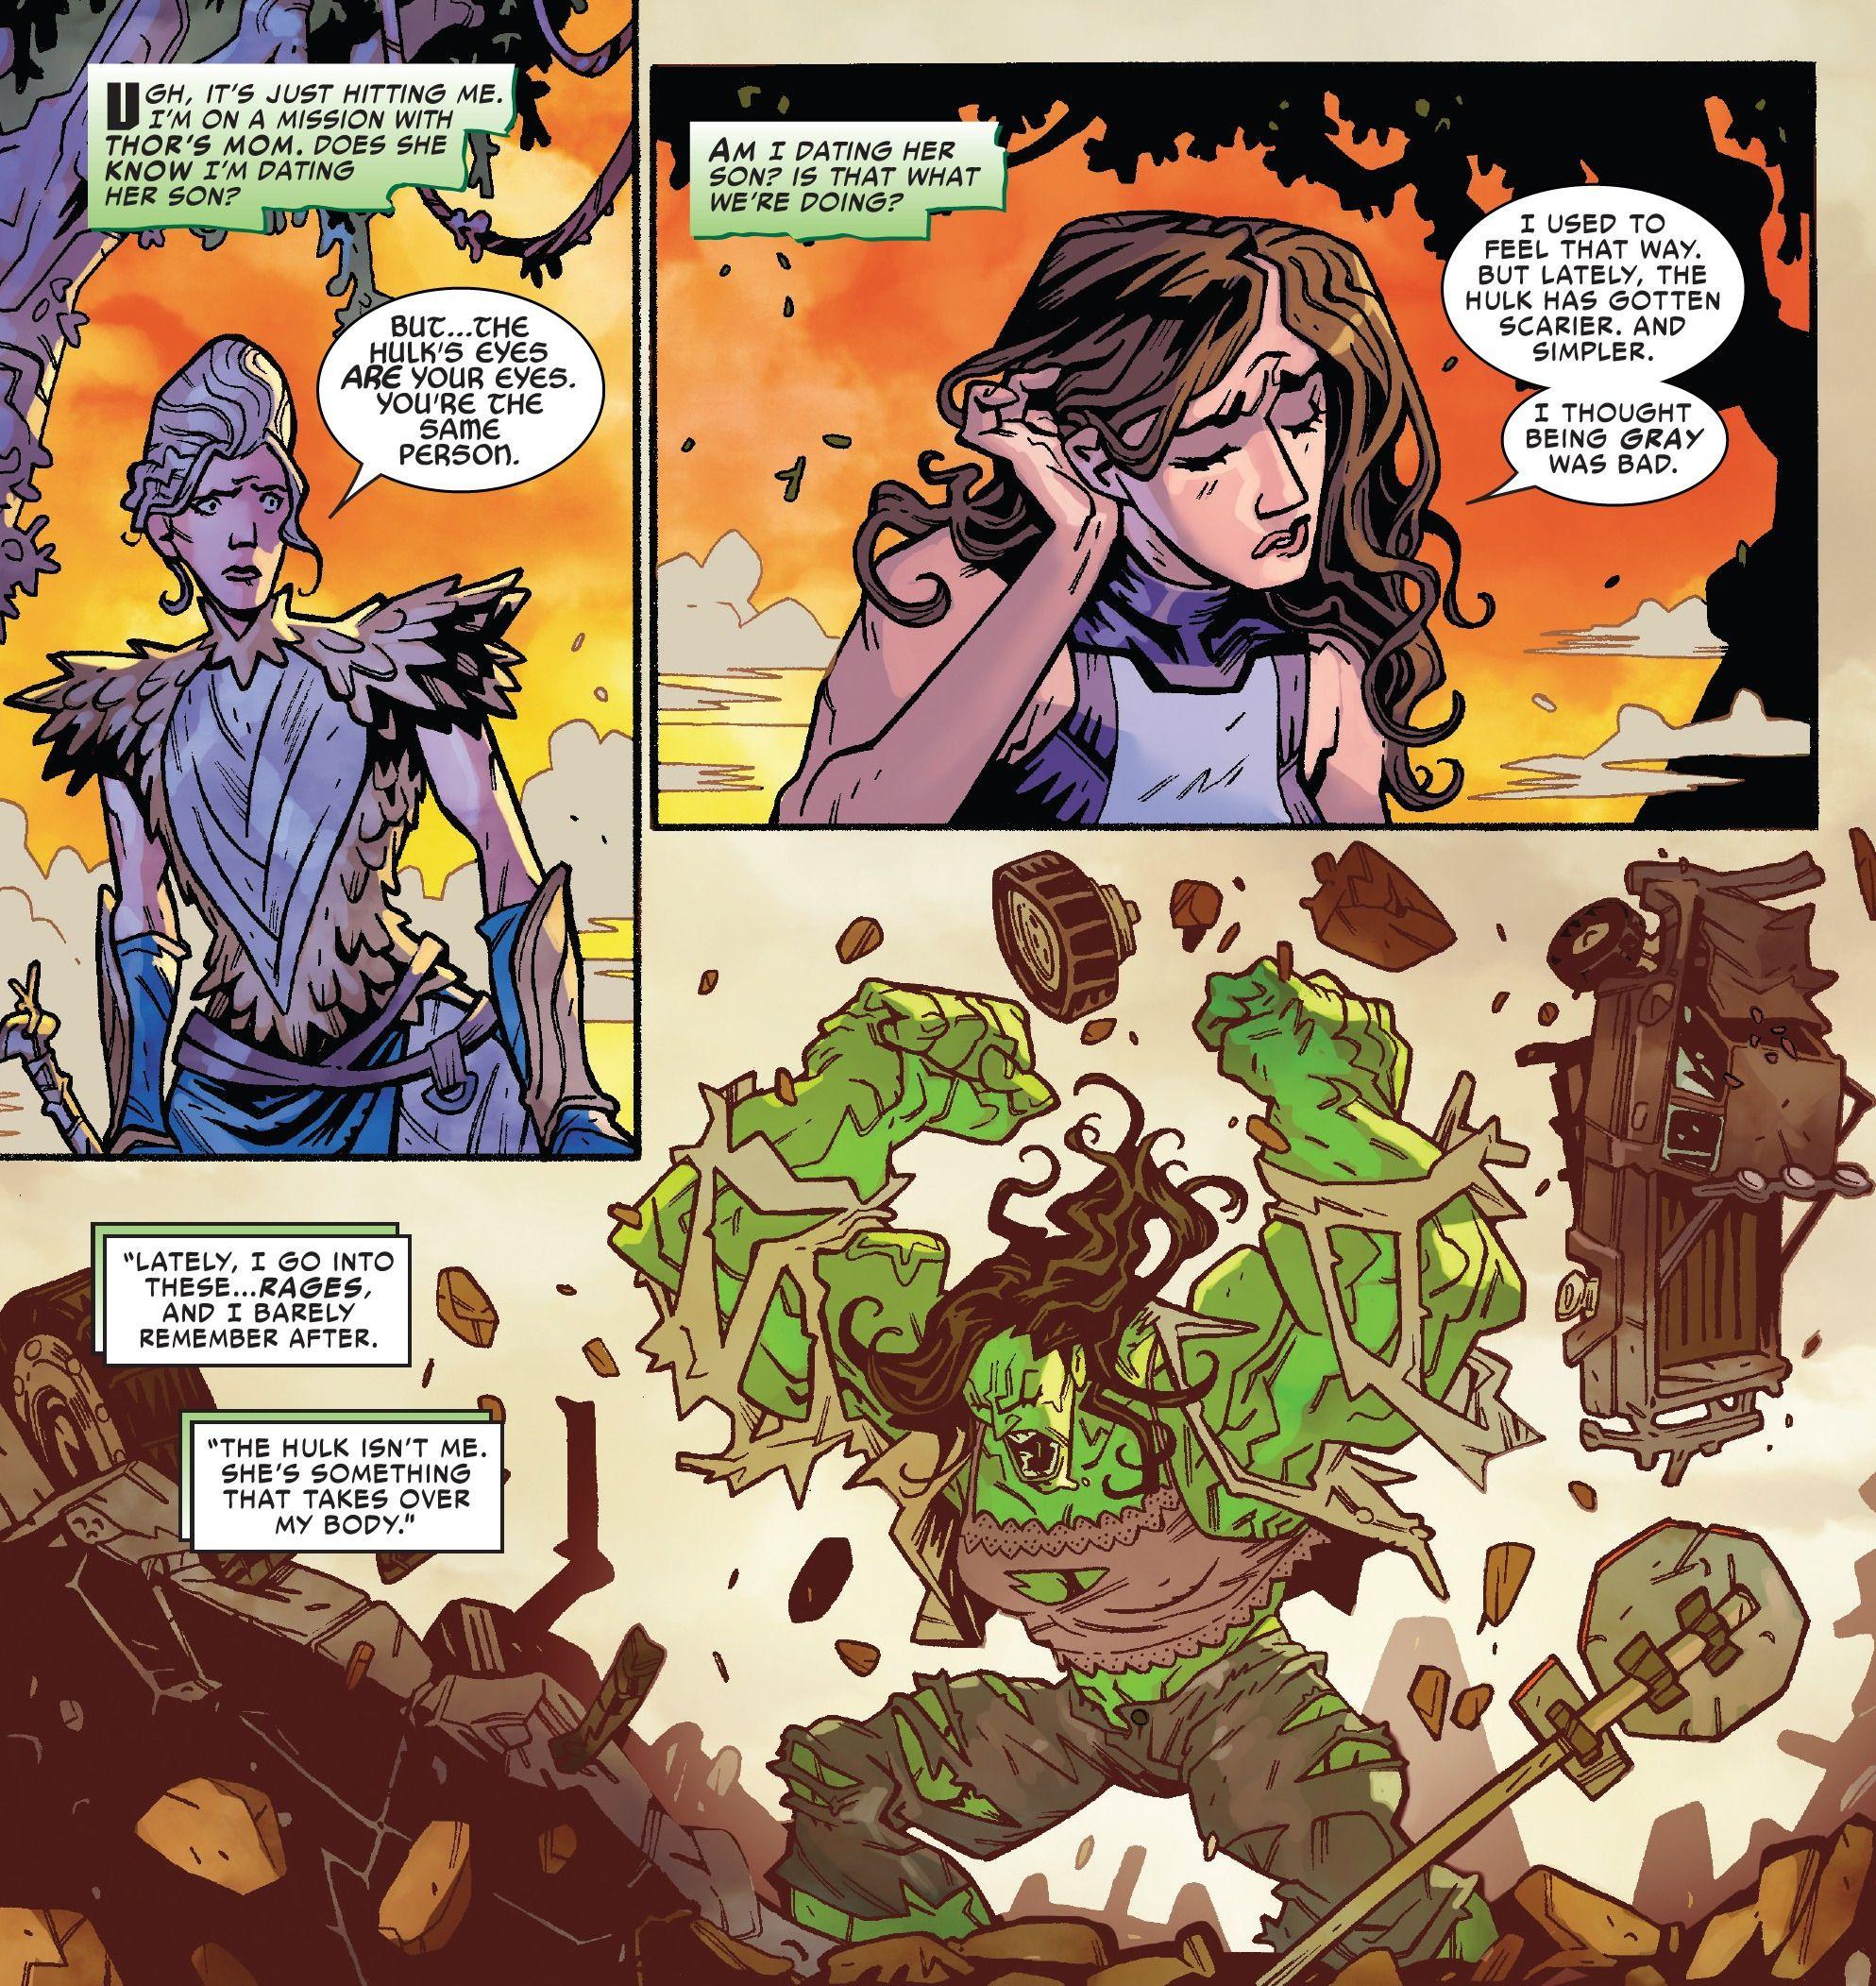 She-Hulk 2020 Wallpapers - Wallpaper Cave